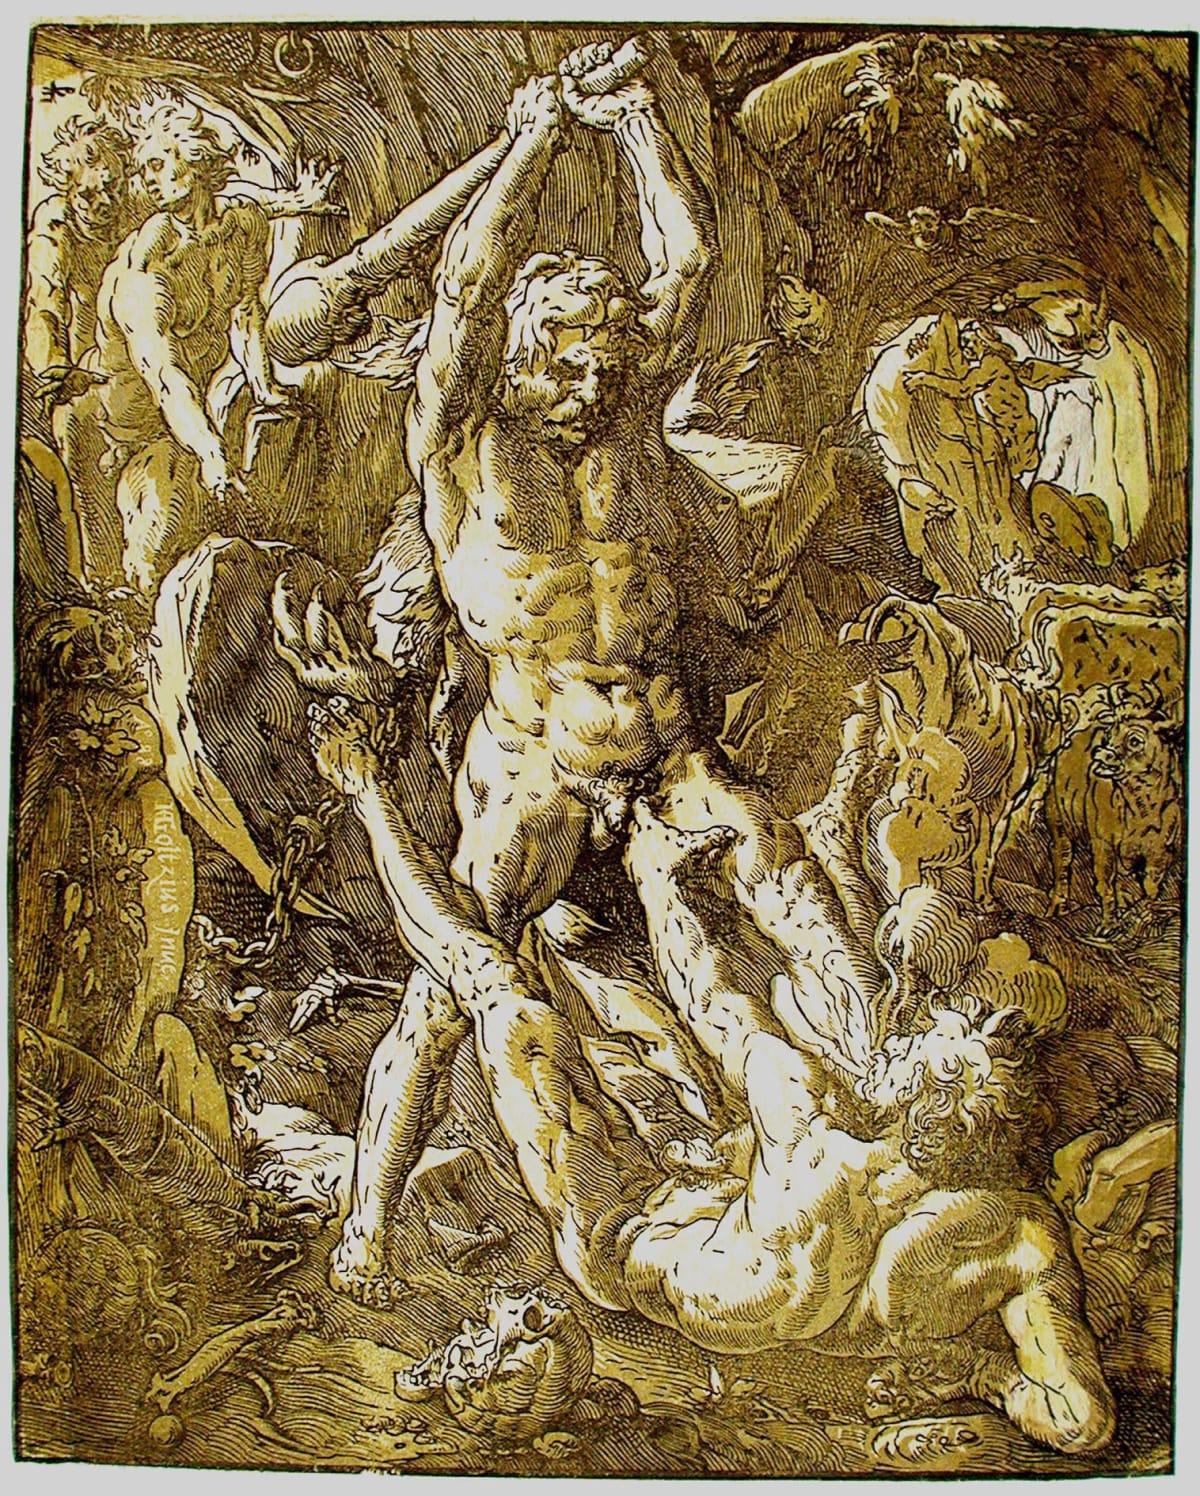 Hendrick Goltzius, Hercules and Cacus, 1588 Chiaroscuro Woodcut